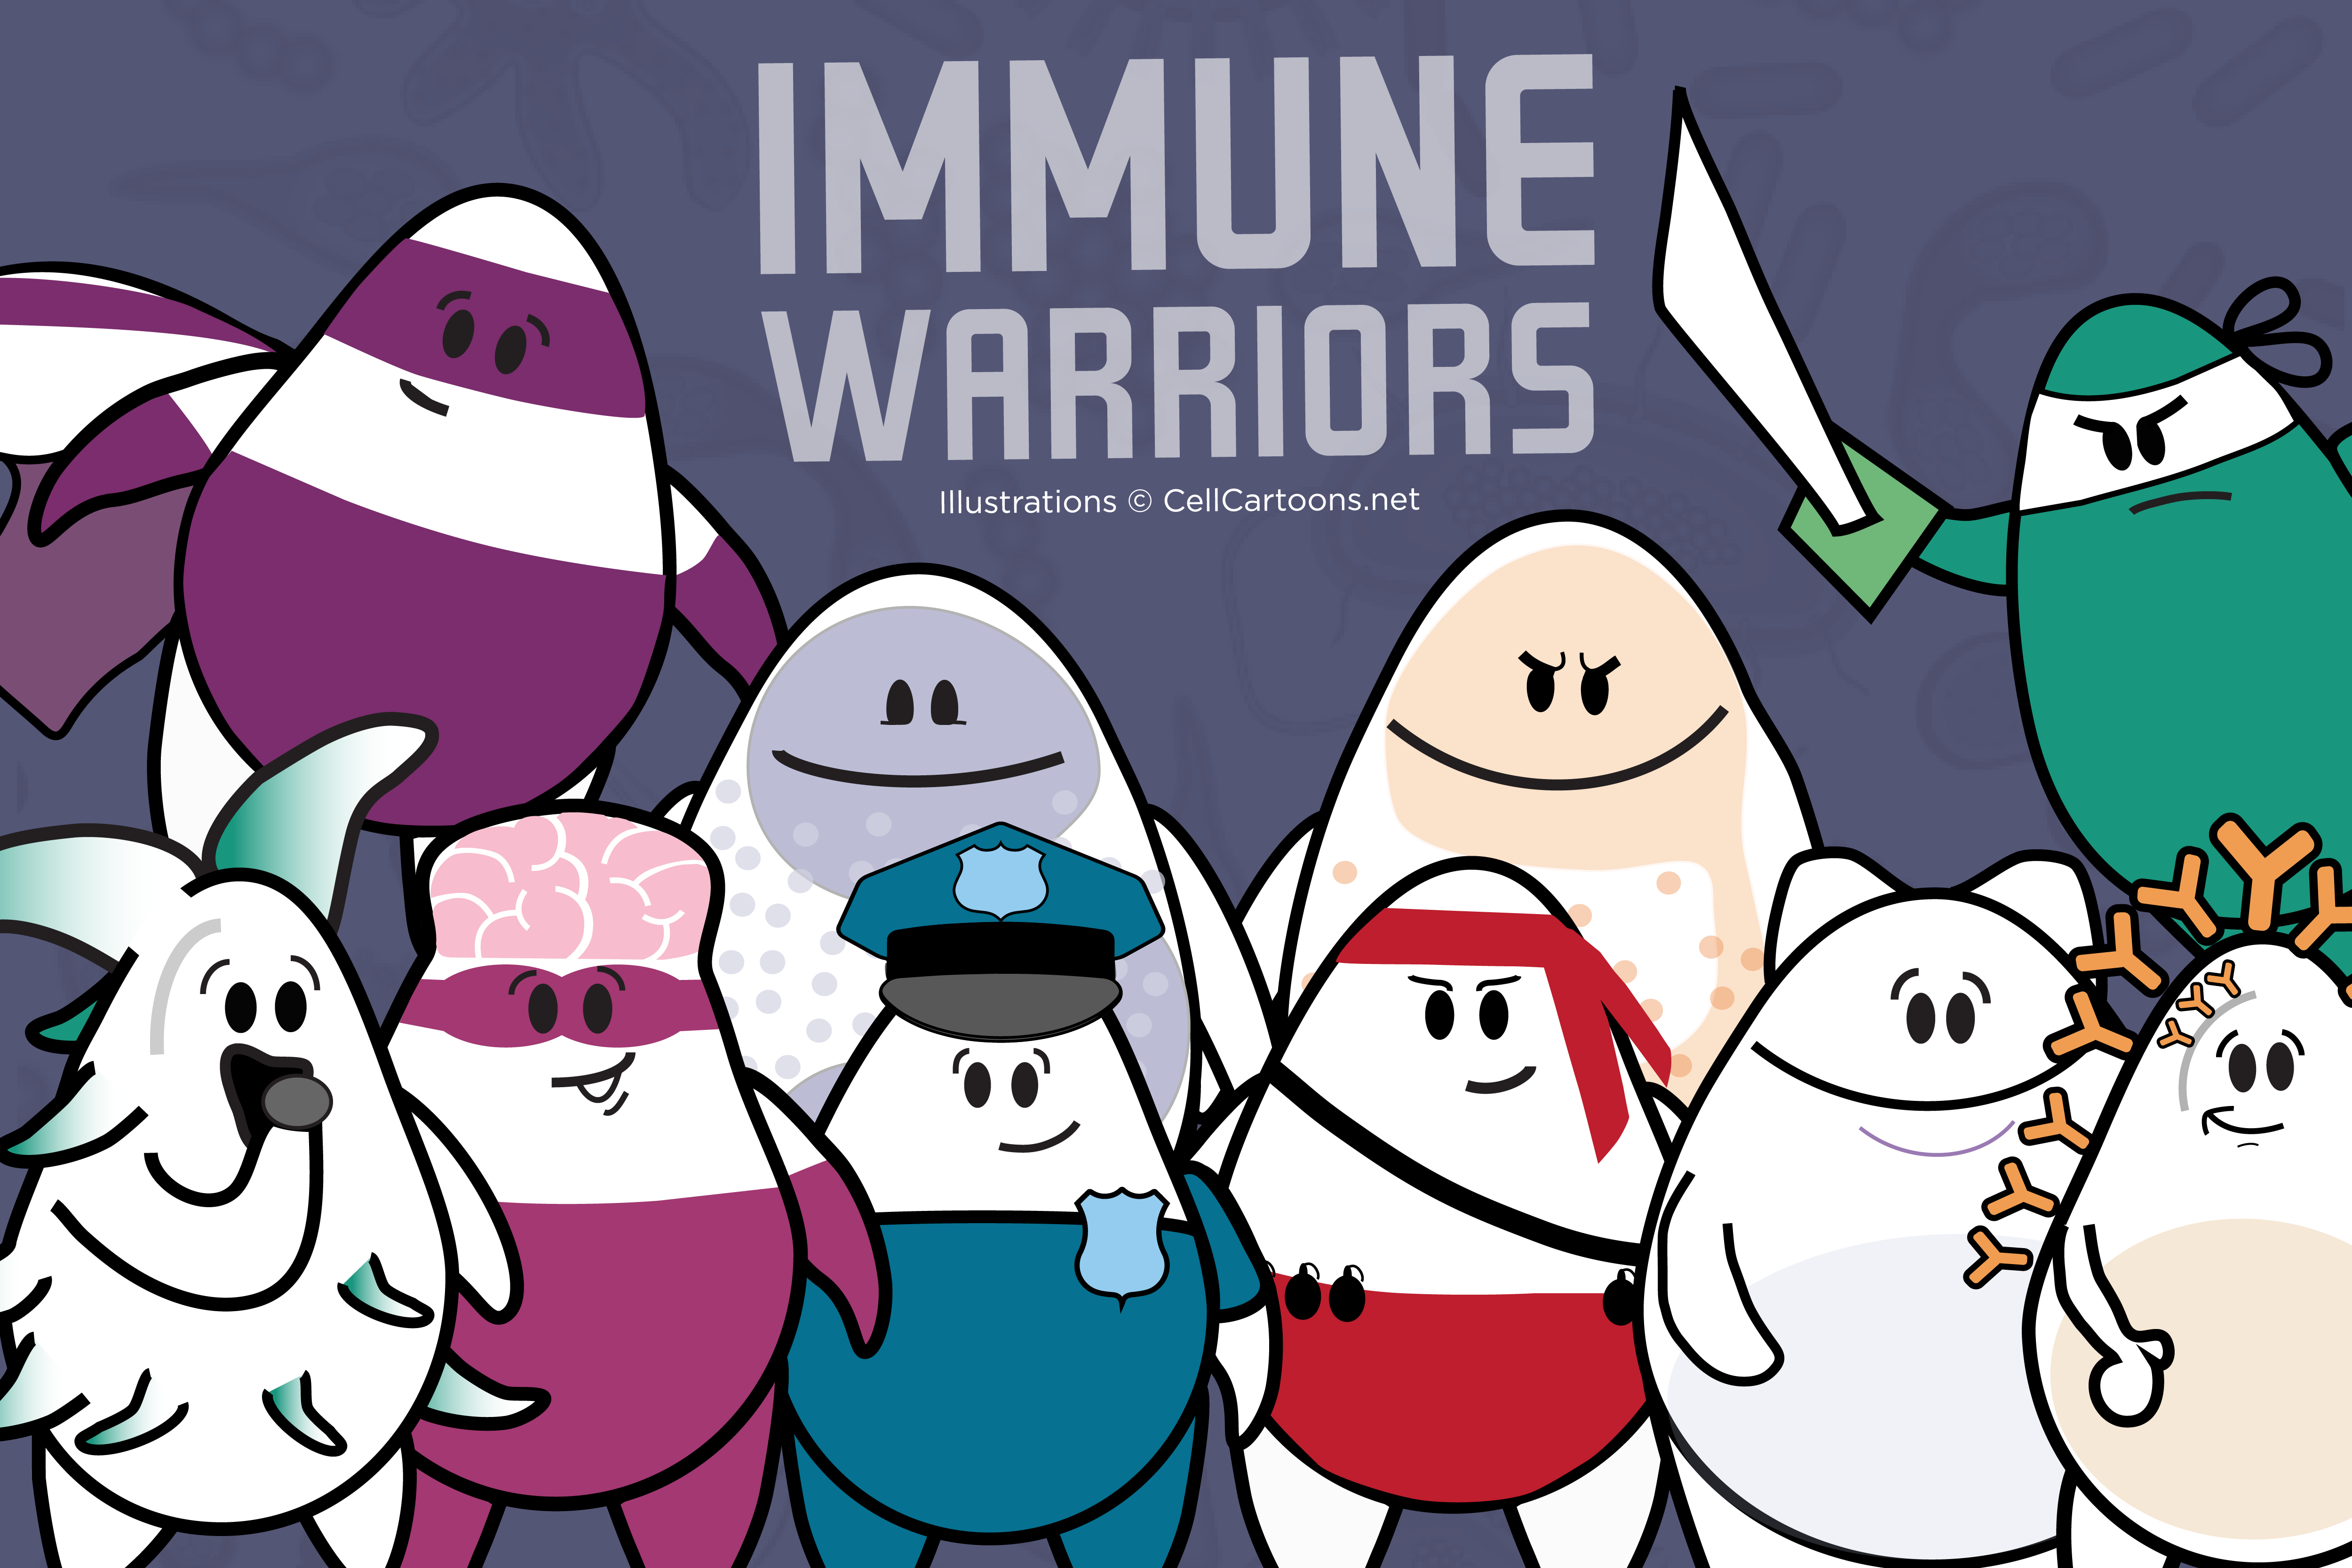 Immune Warriors